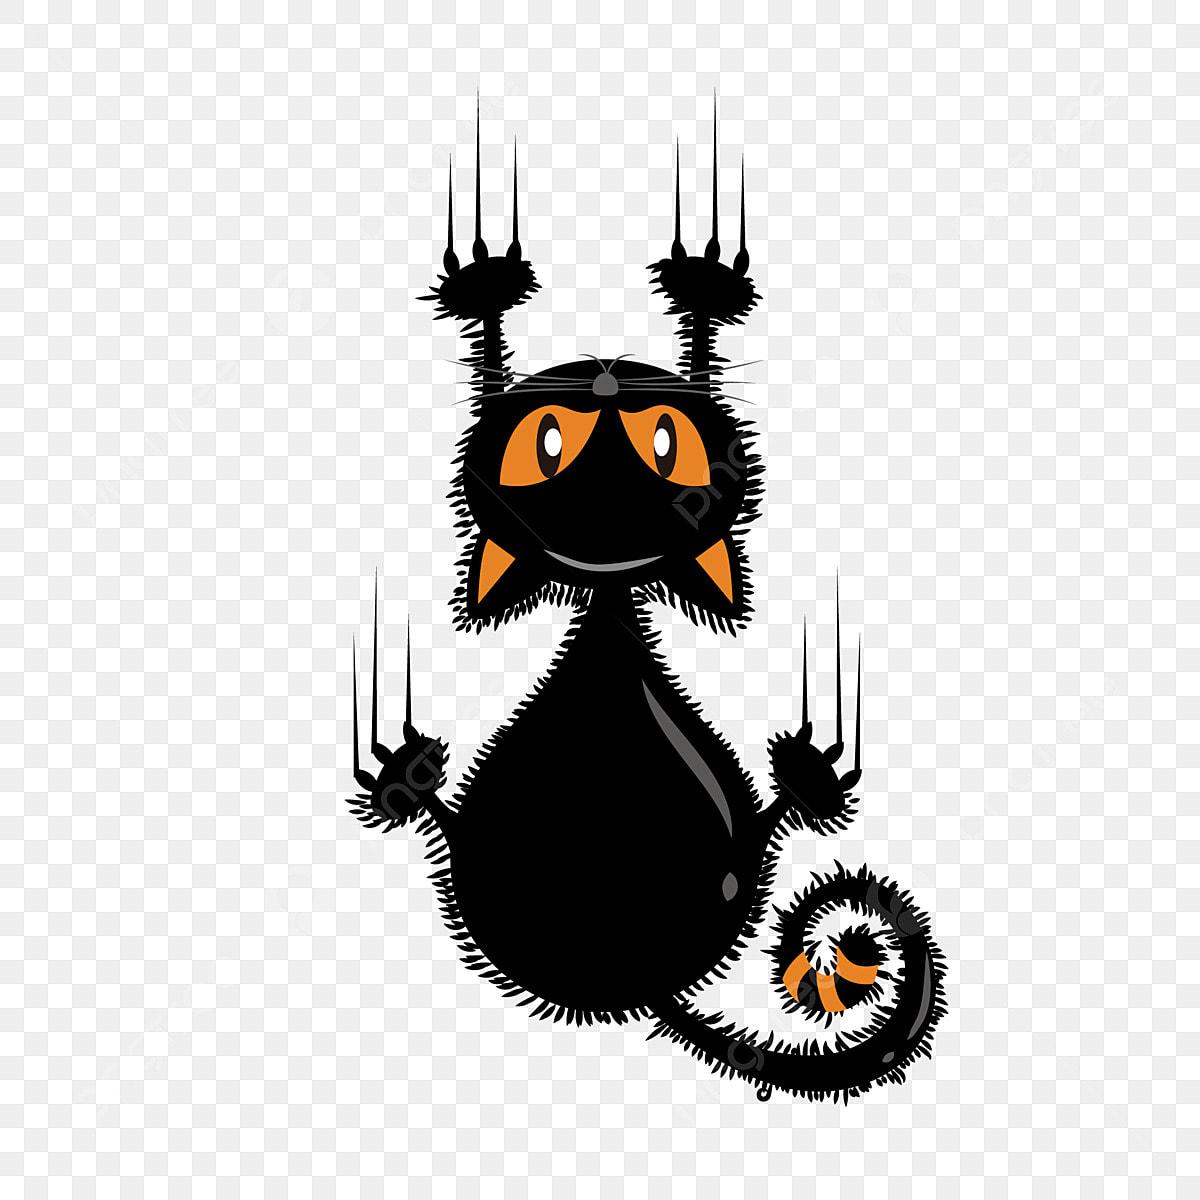 Cartoon Cute Halloween Funny Black Cat Illustration ...